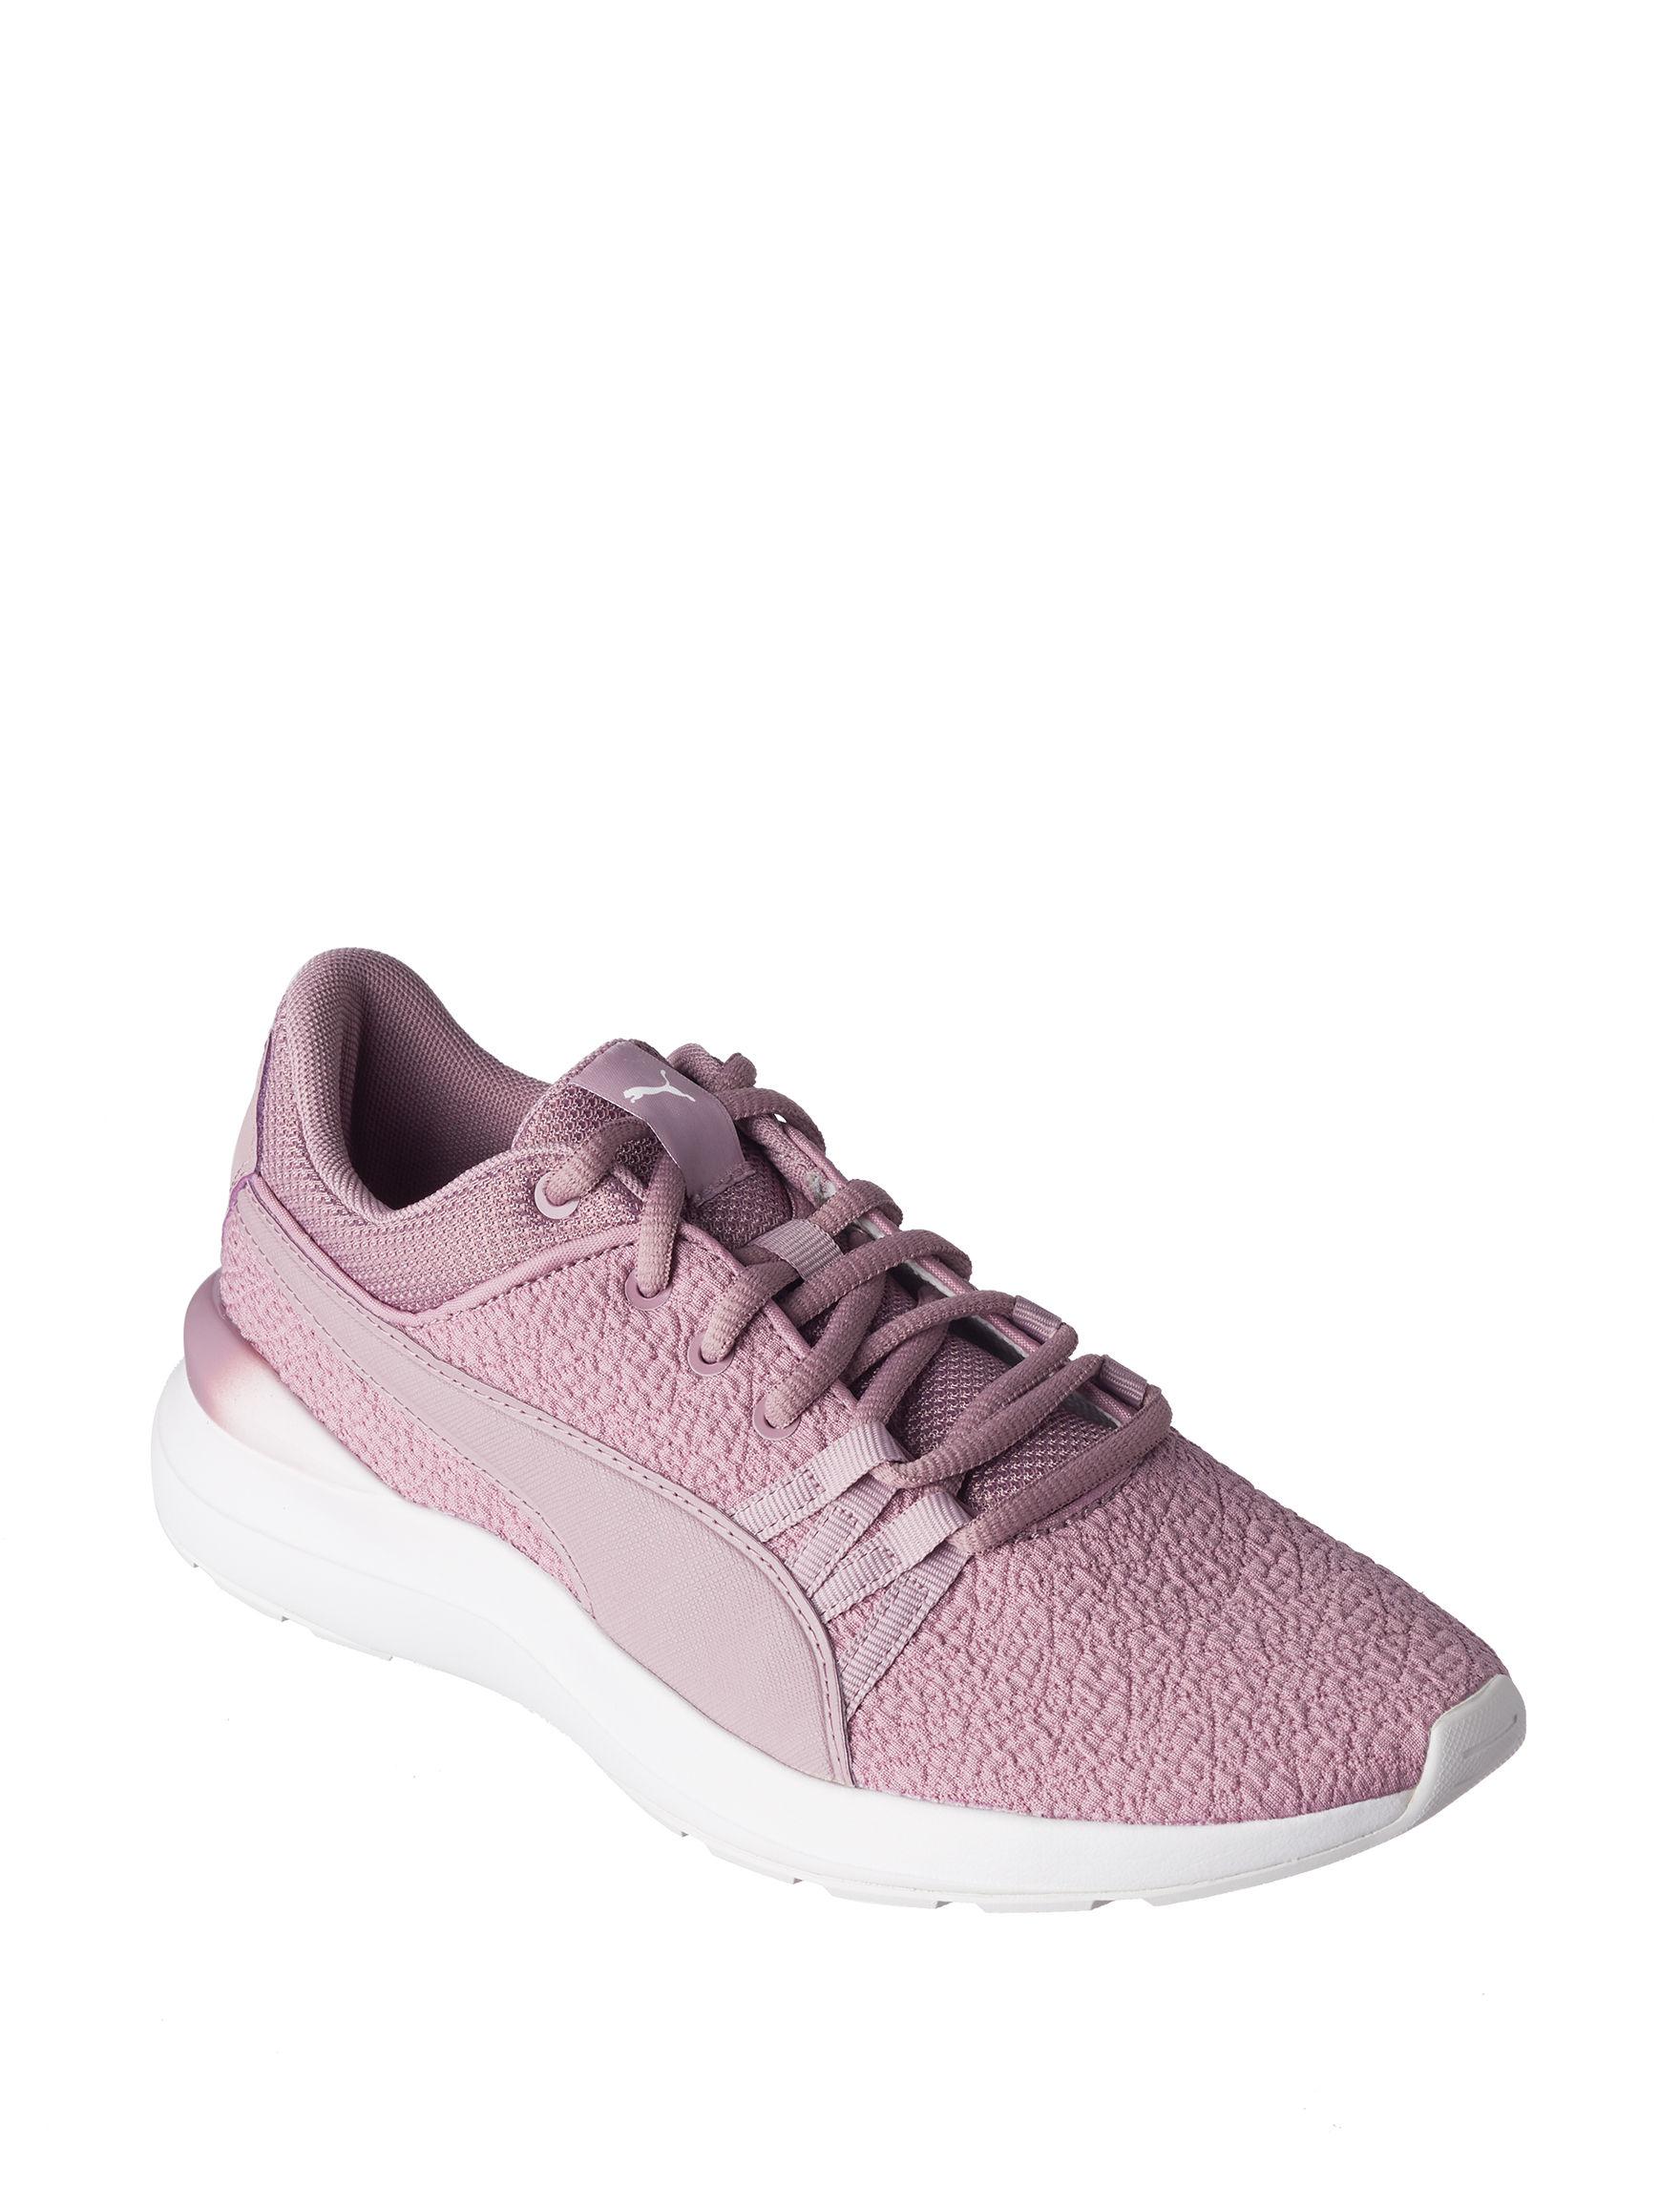 Puma Purple Comfort Shoes